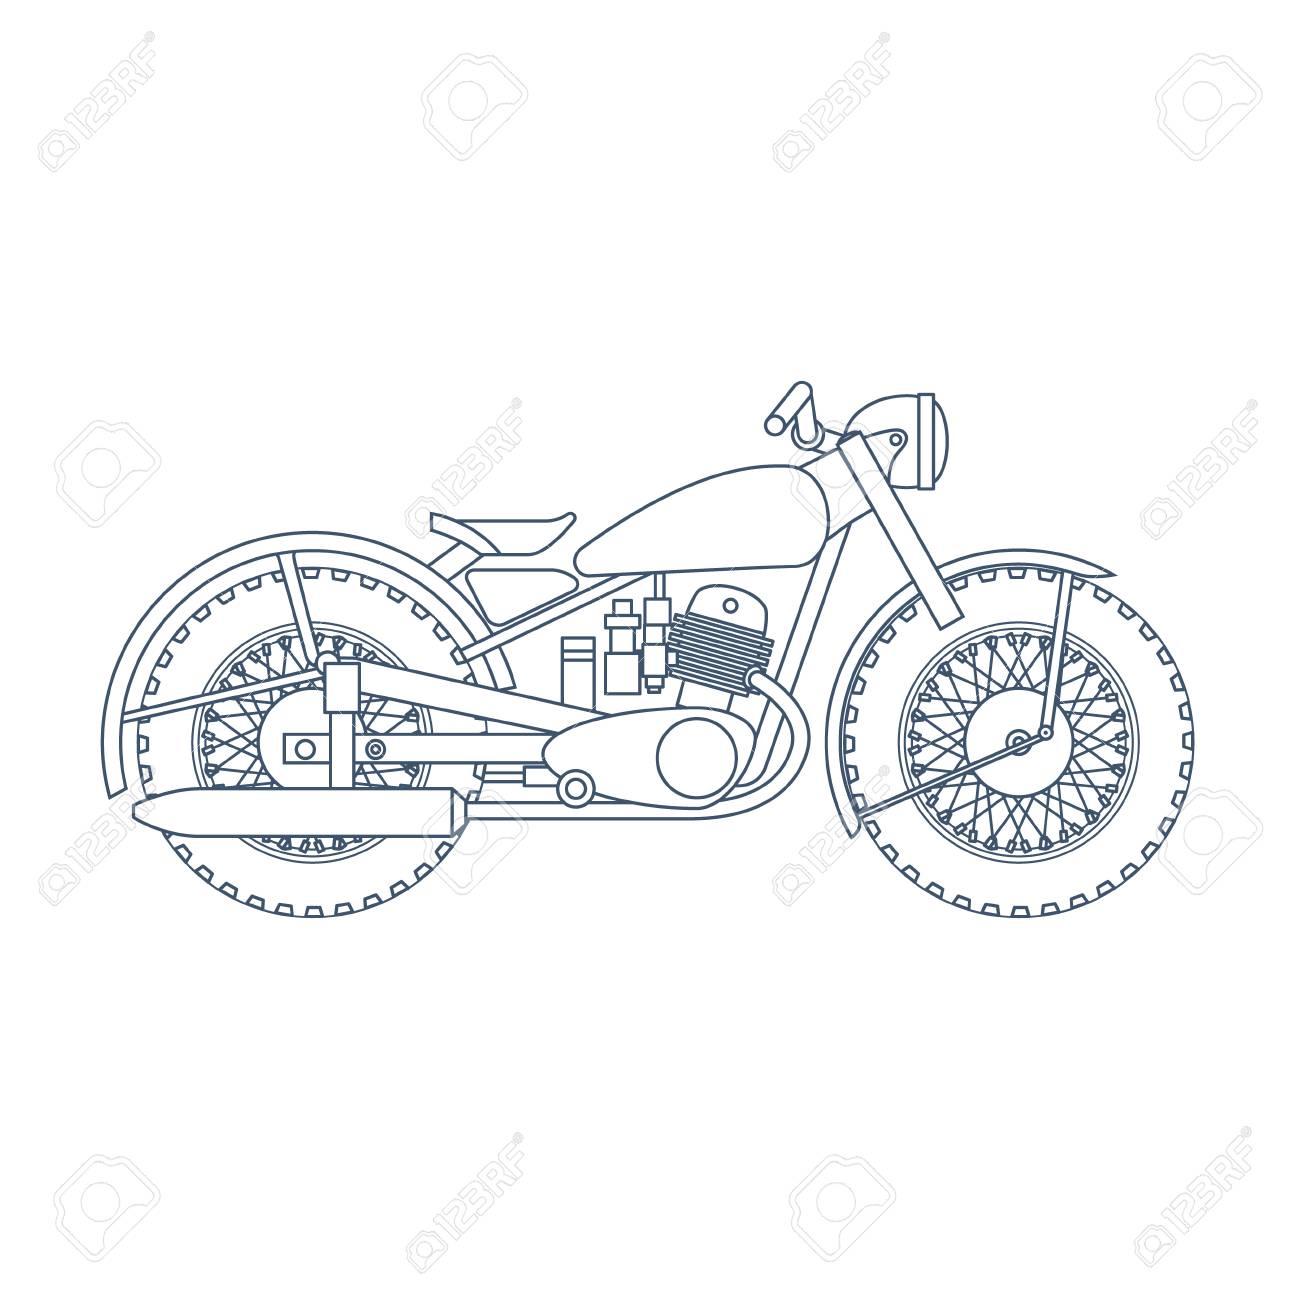 vintage motorcycle design template for bike shop or motorcycle